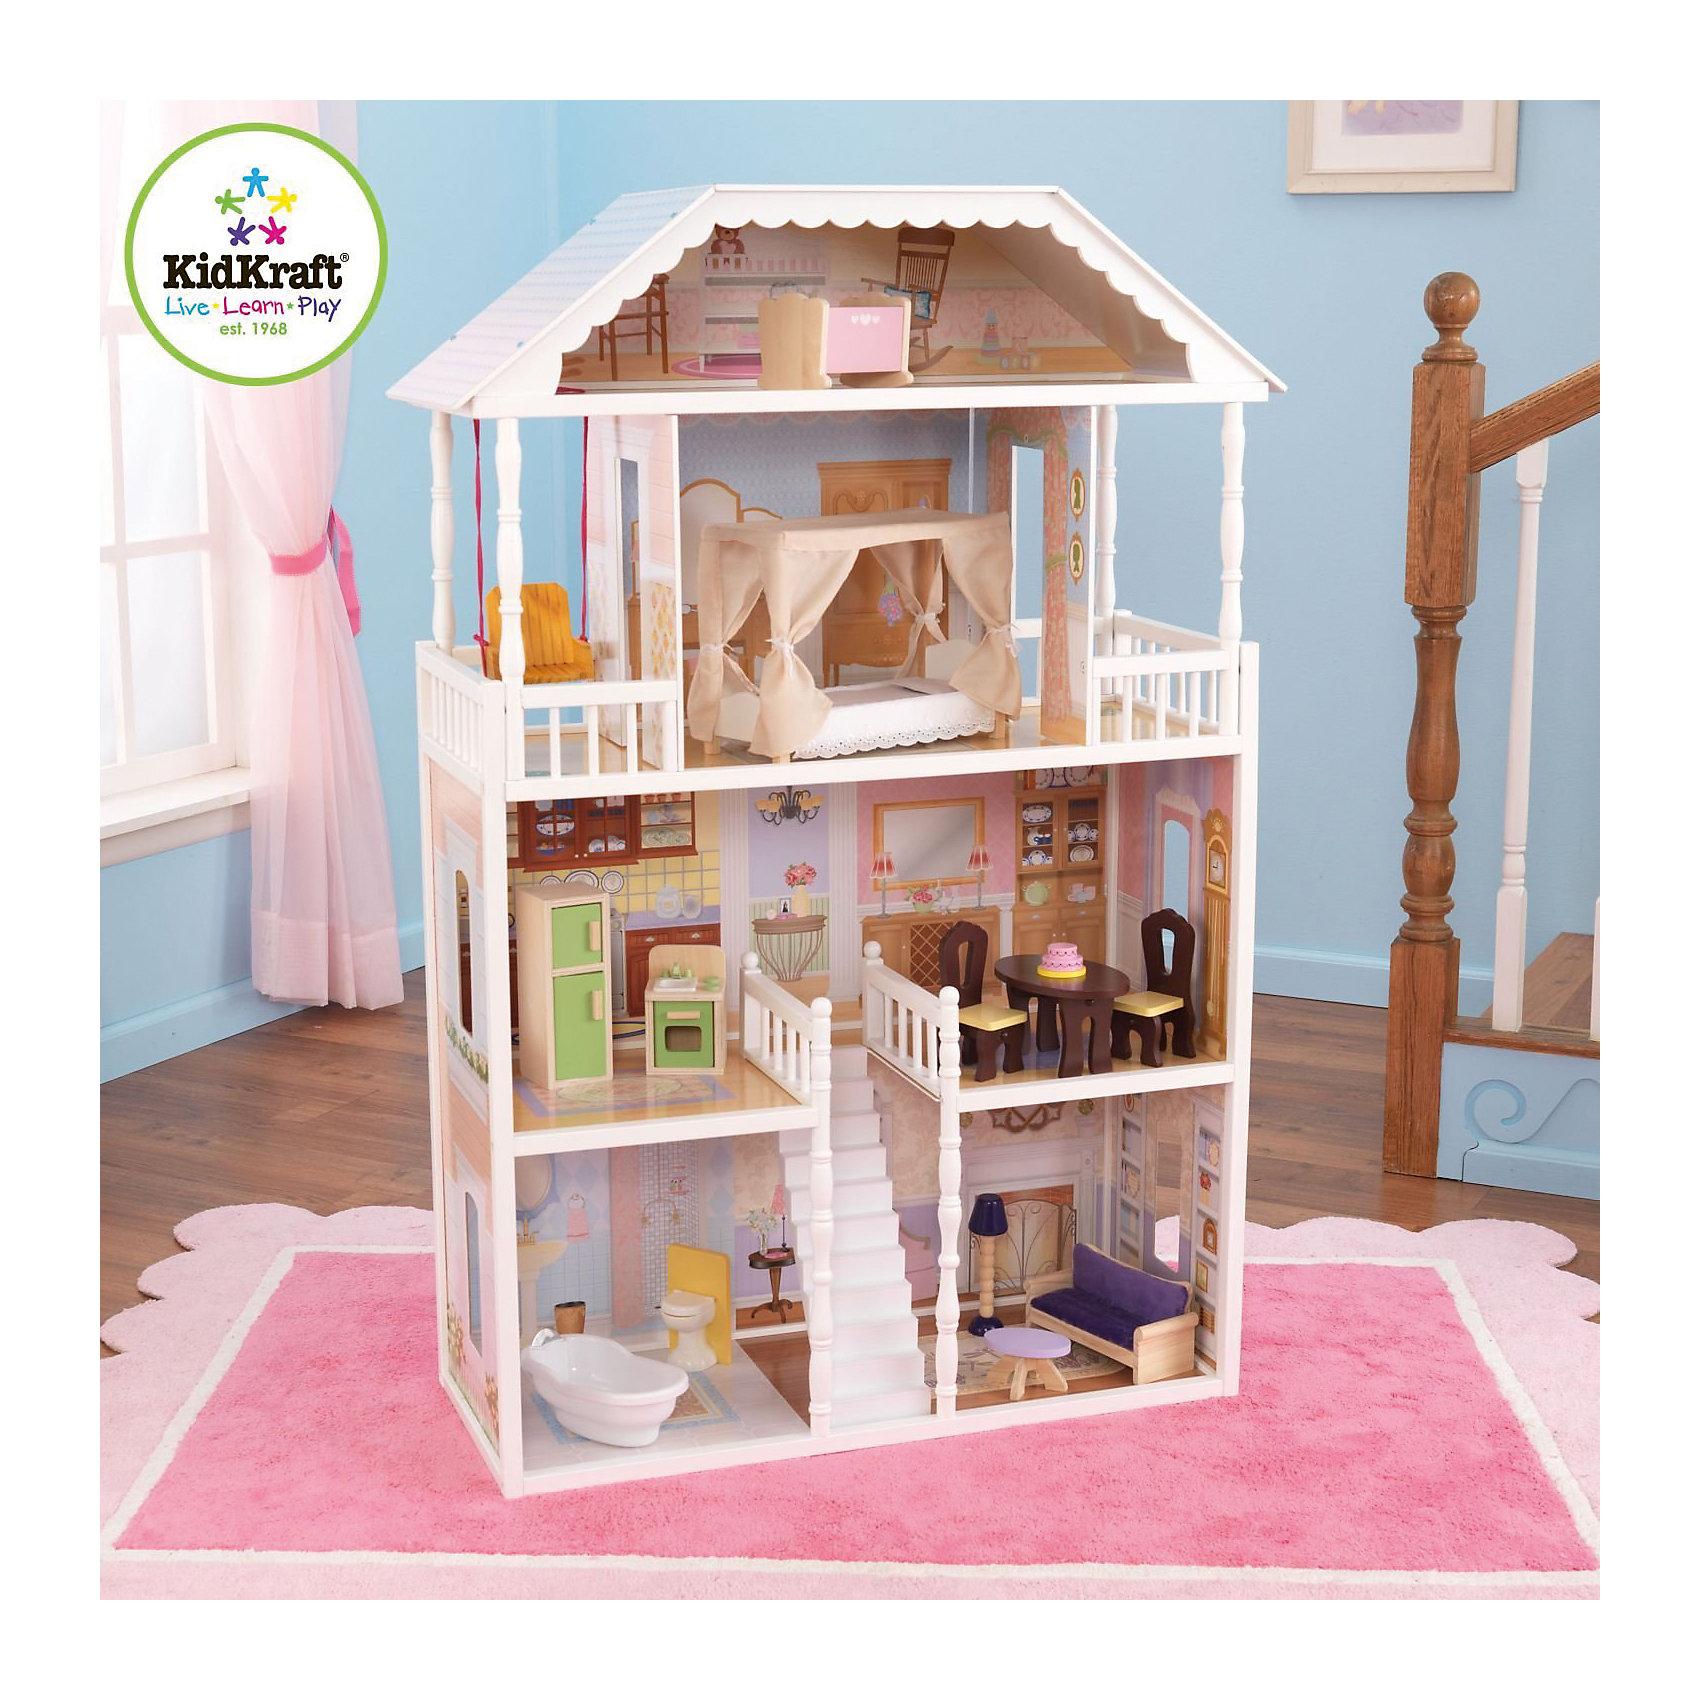 KidKraft Кукольный домик для Барби Саванна (Savannah), с мебелью, 14 предм., KidKraft kidkraft кукольный домик загородная усадьба